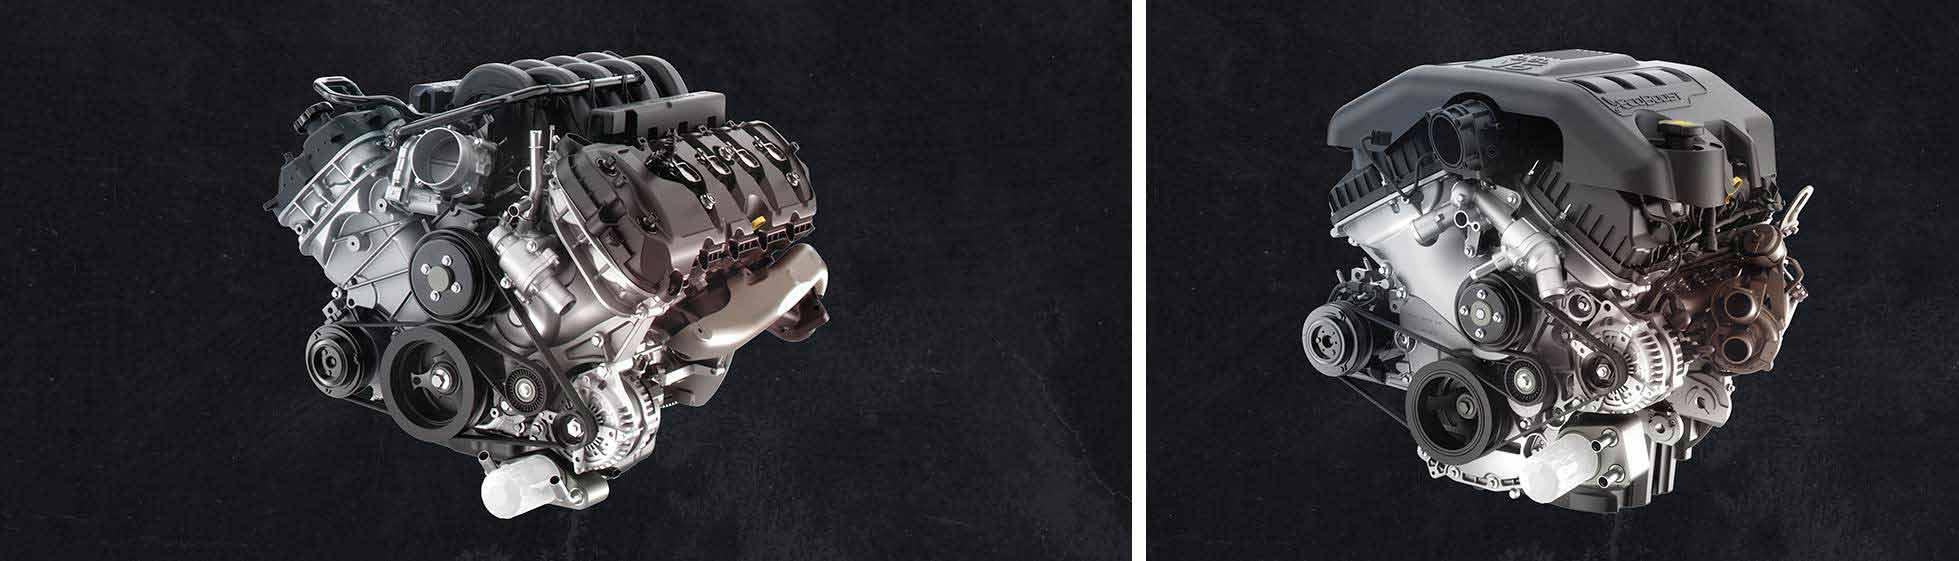 2018 F-150 Engines